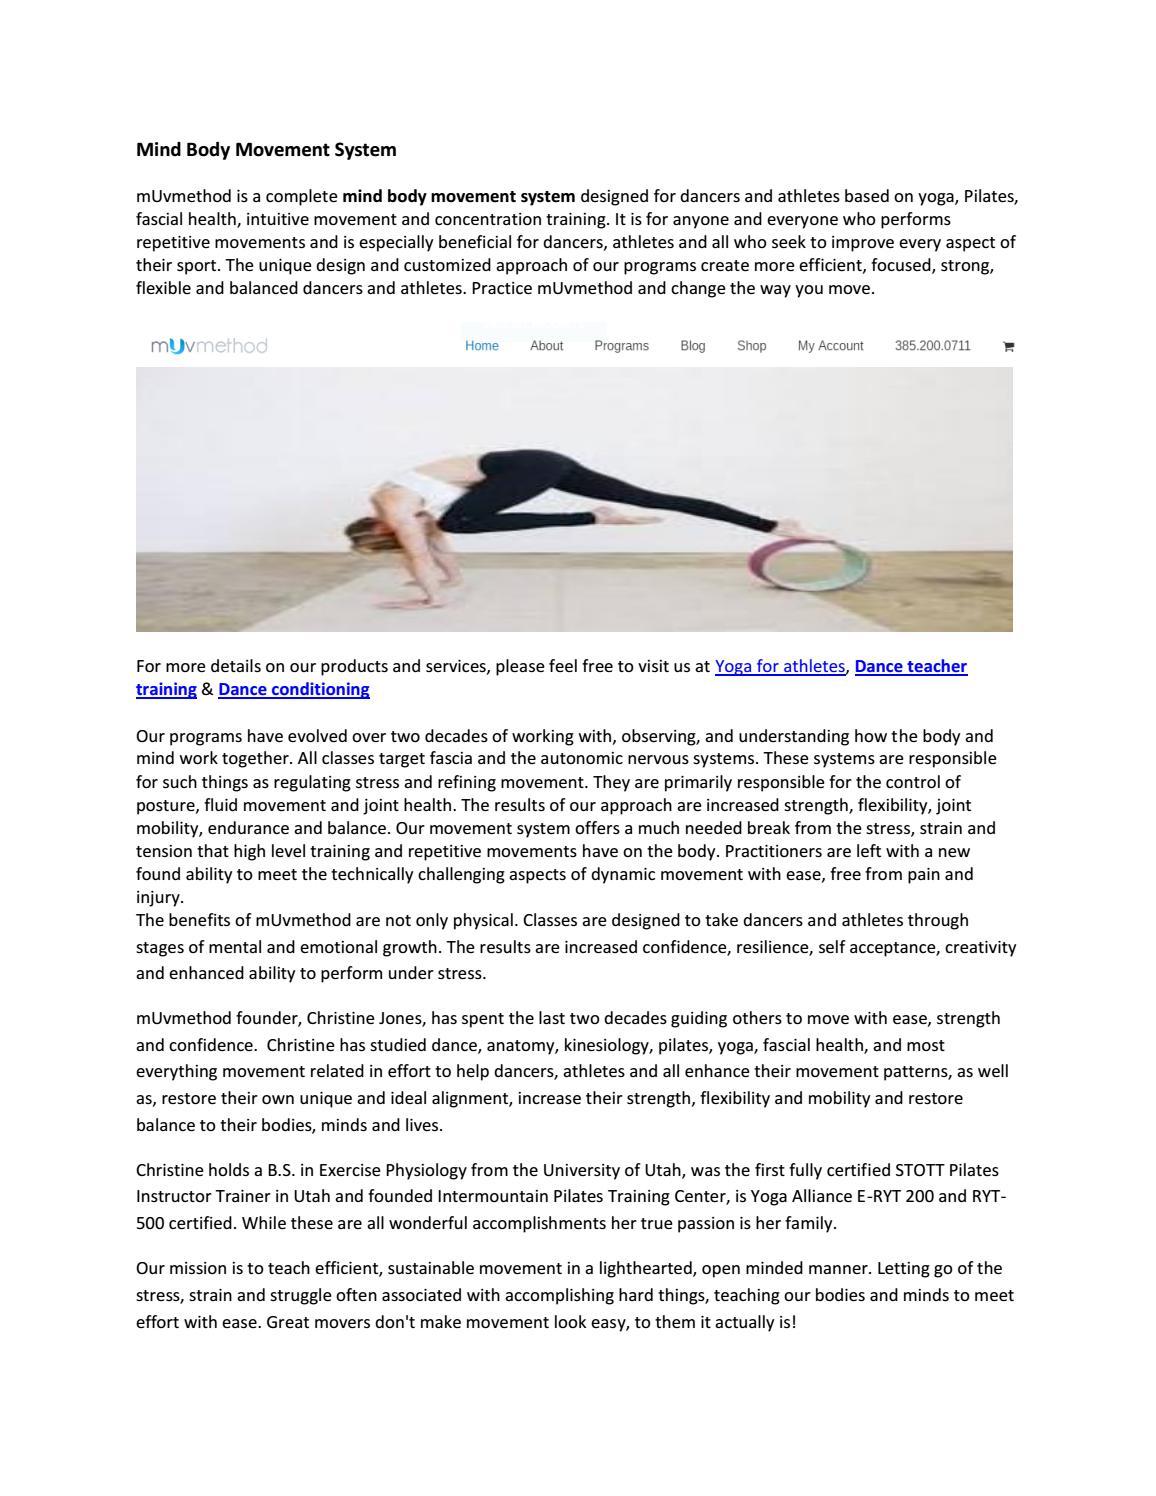 Mind body movement system by mUvmethod - issuu